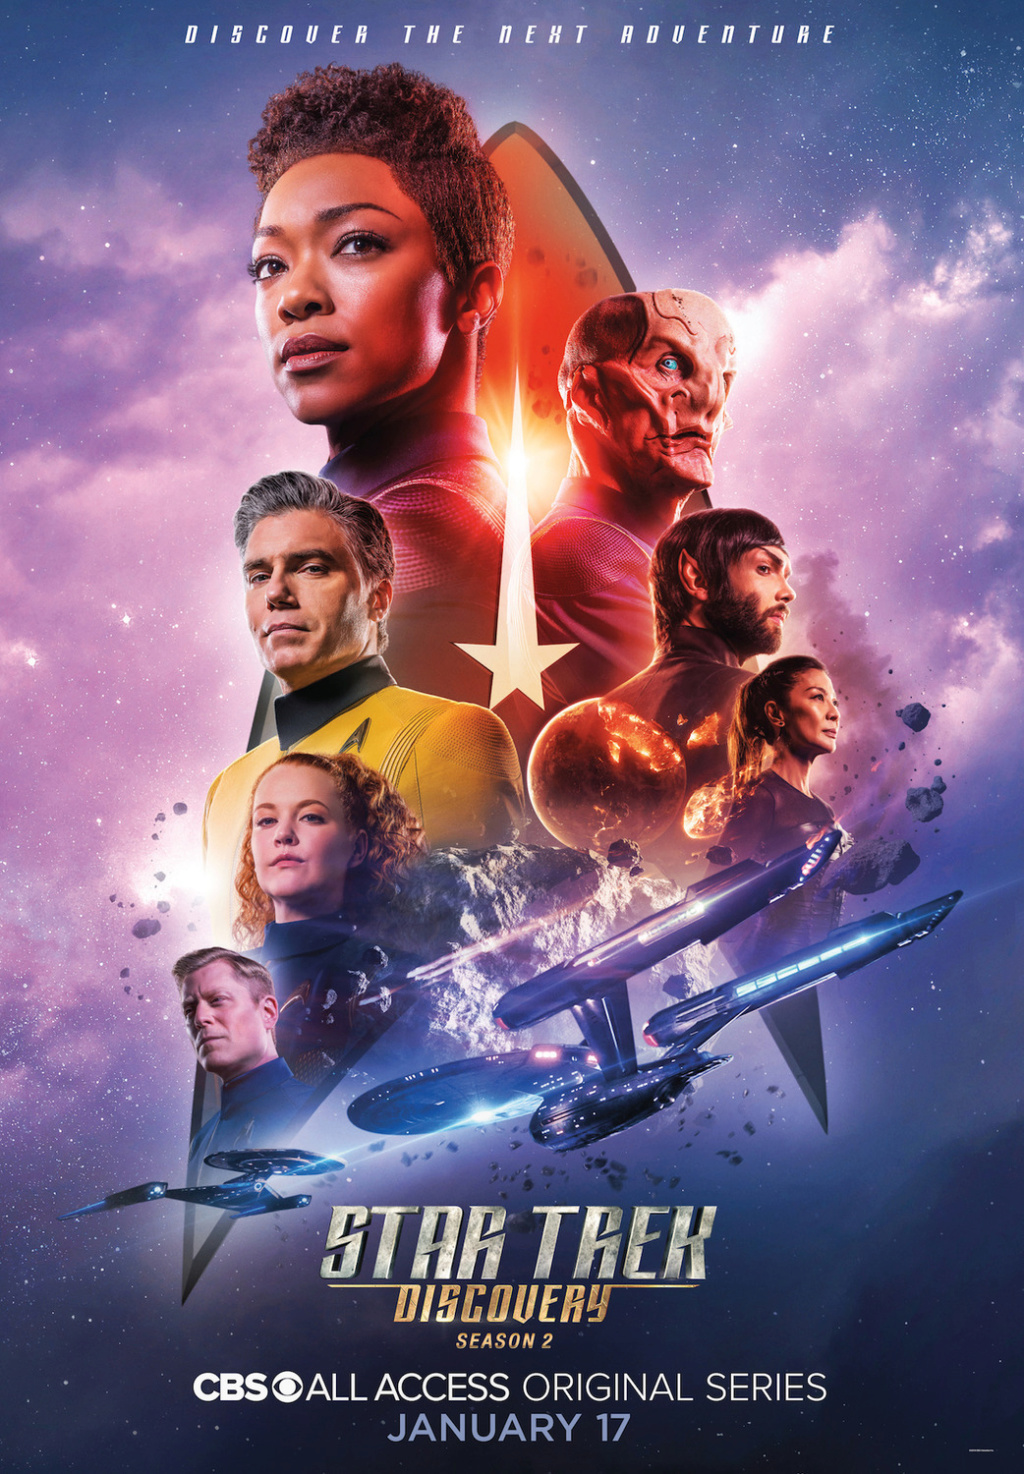 Star Trek Discovery (2017) - Page 2 Mv5bot10